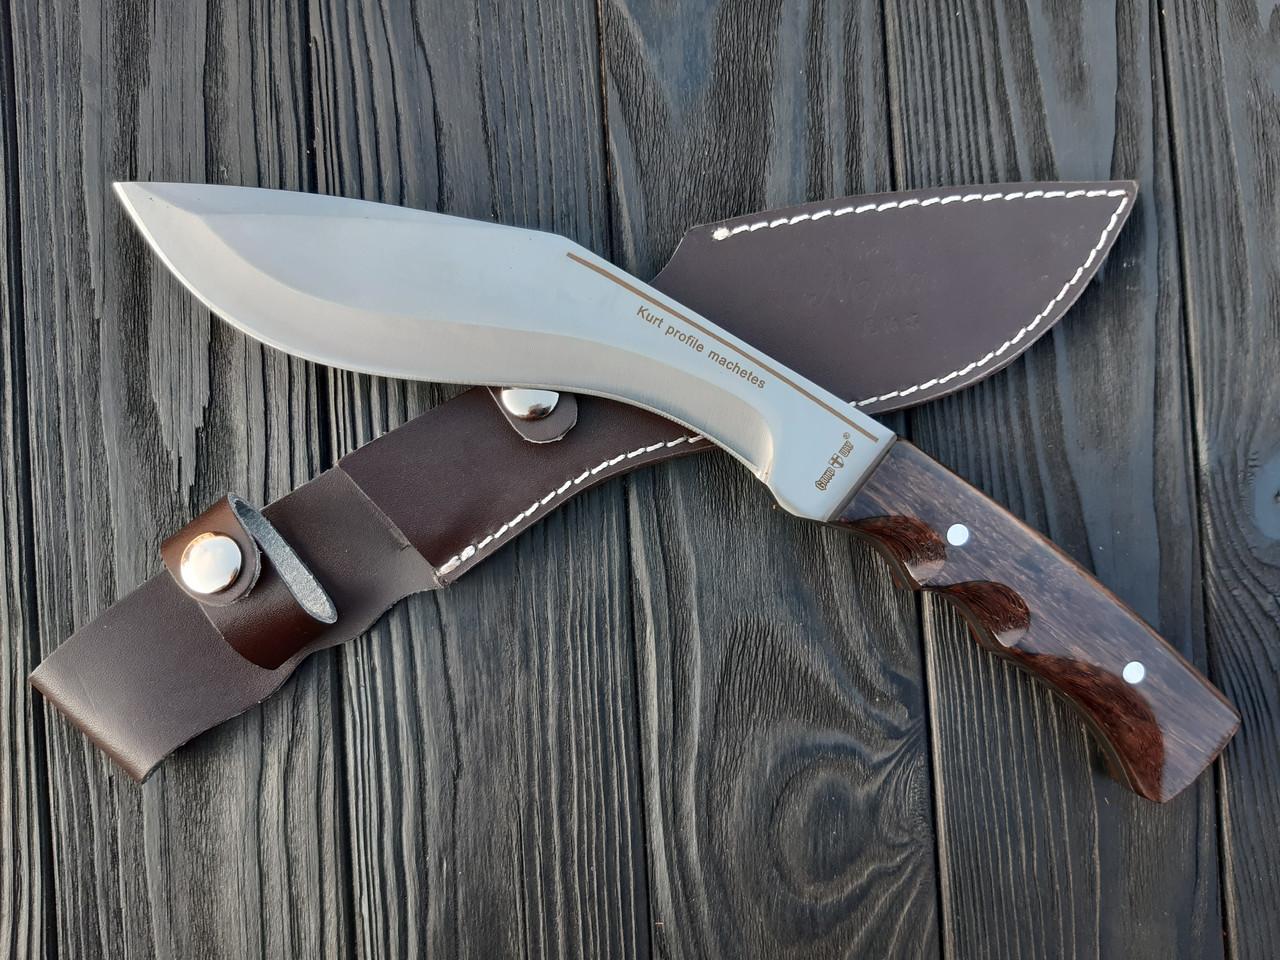 Нож кукри непальский  мачете в чехле   Xn 24   6.5 мм